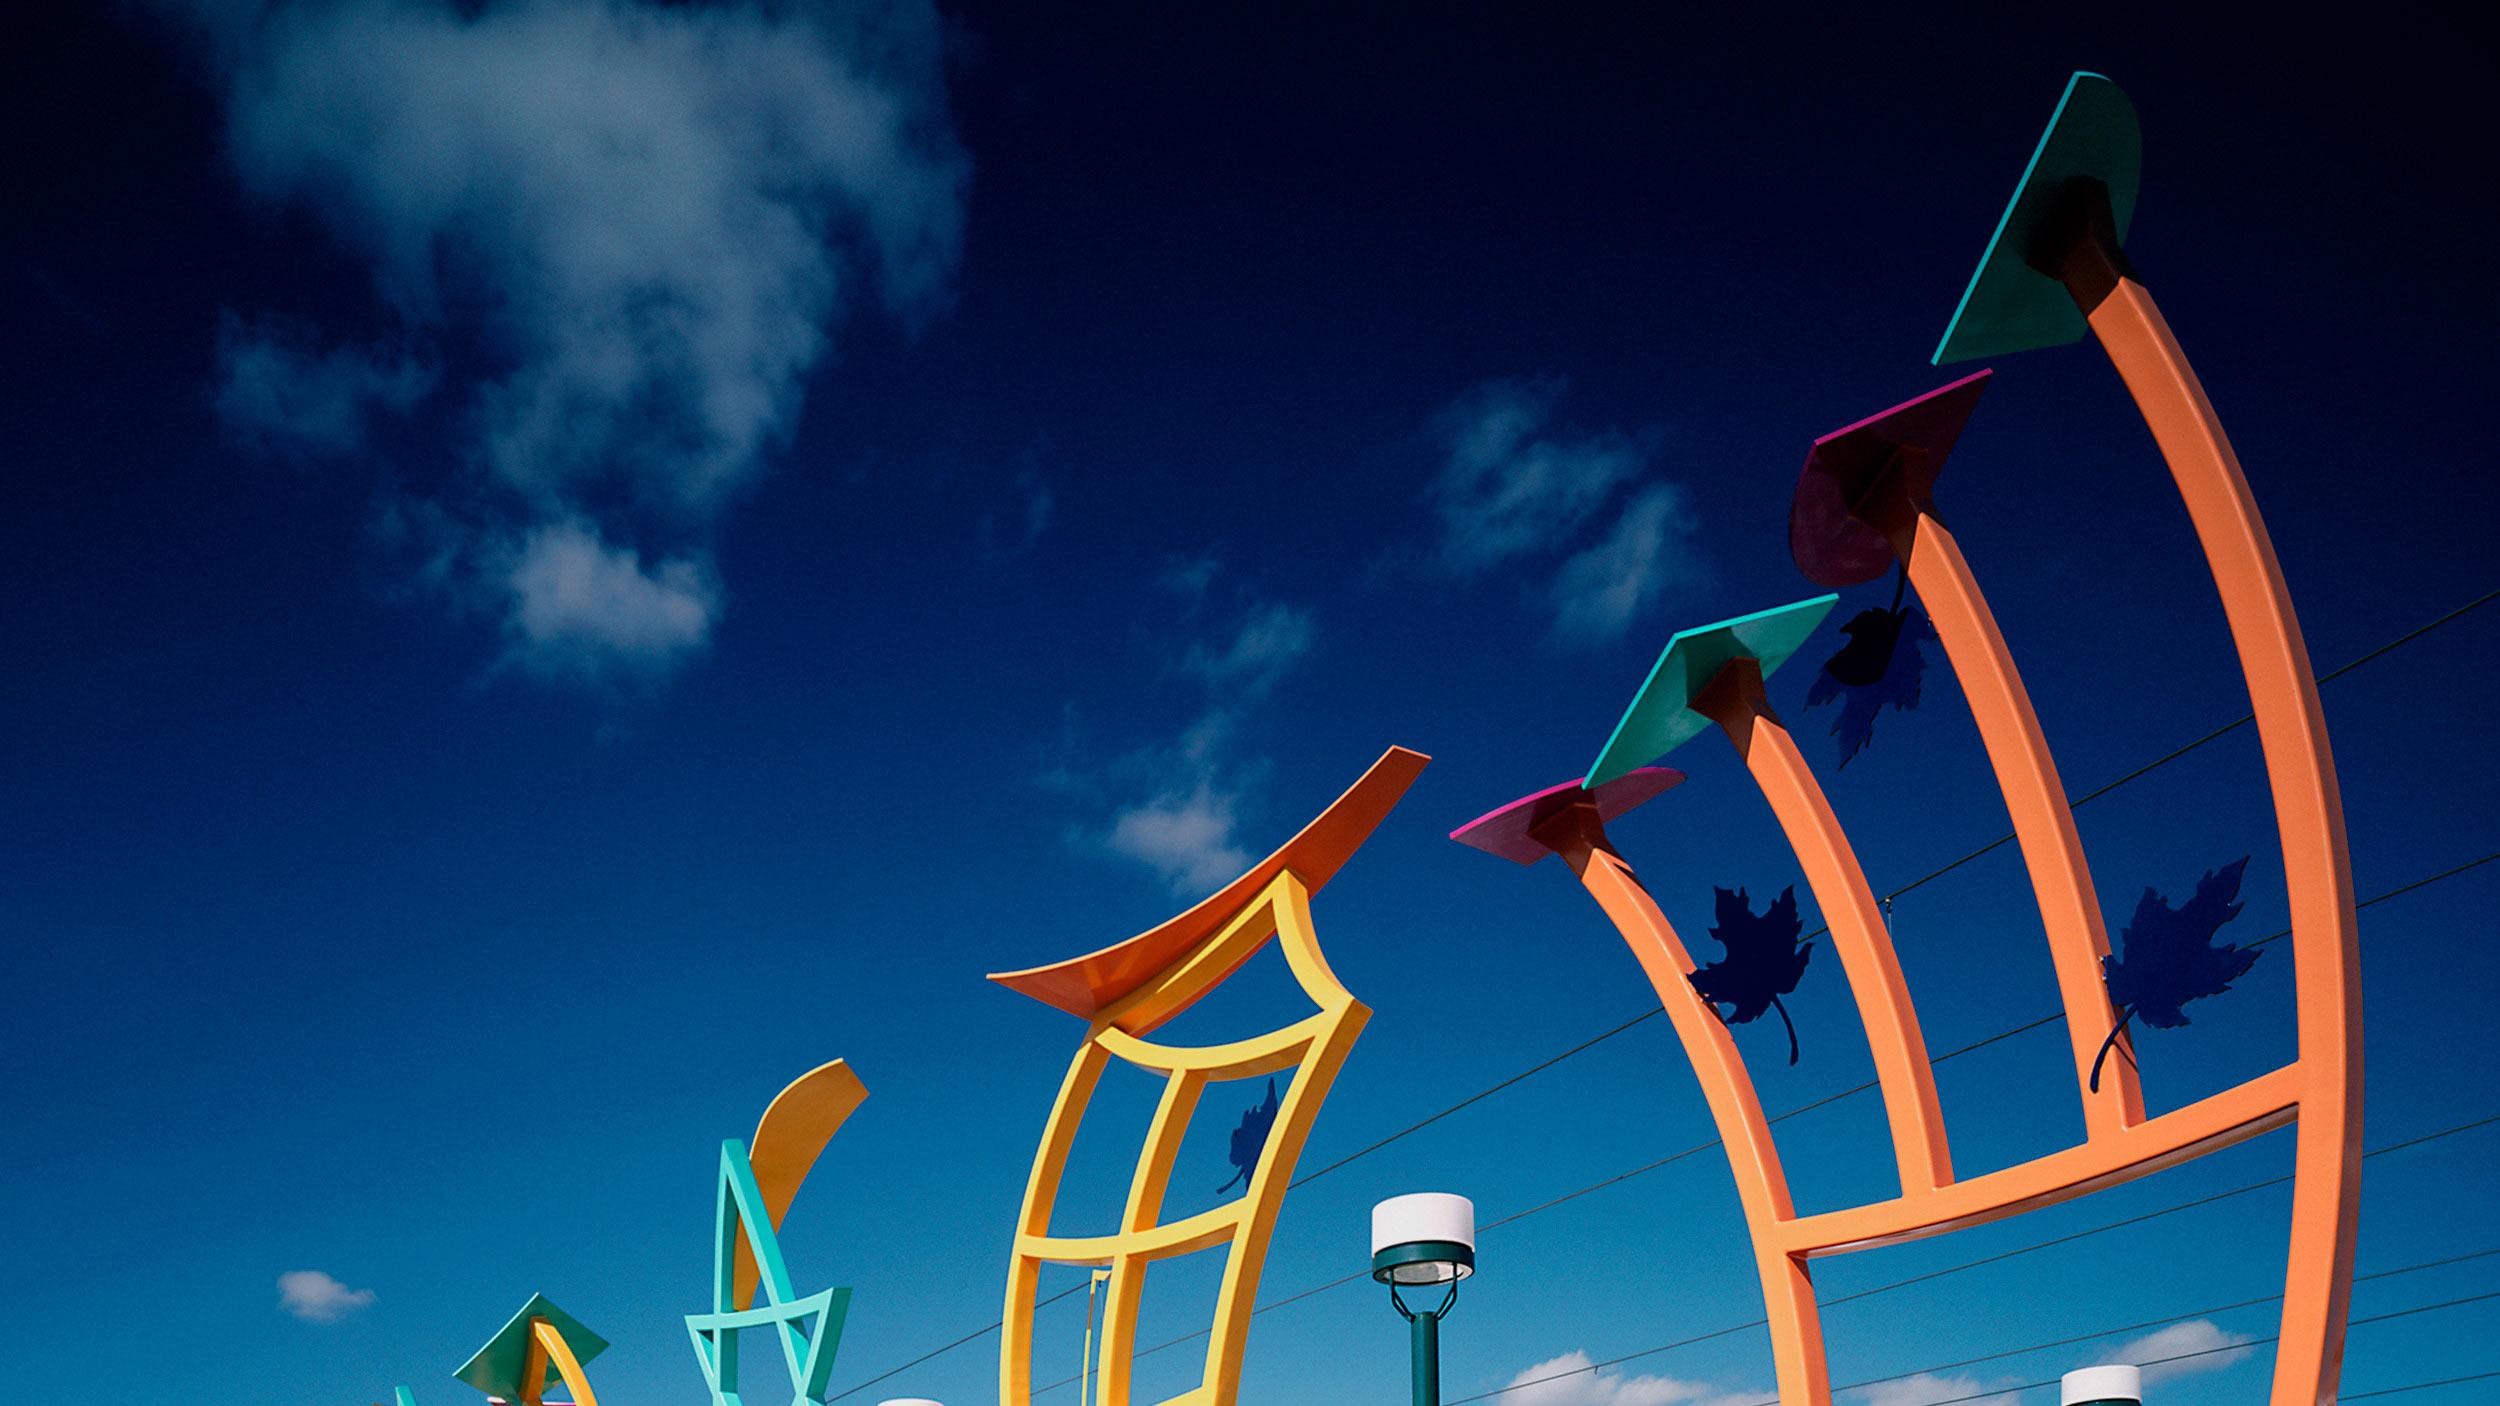 David Griggs Seven Sisters Metal Light Rail Public Art